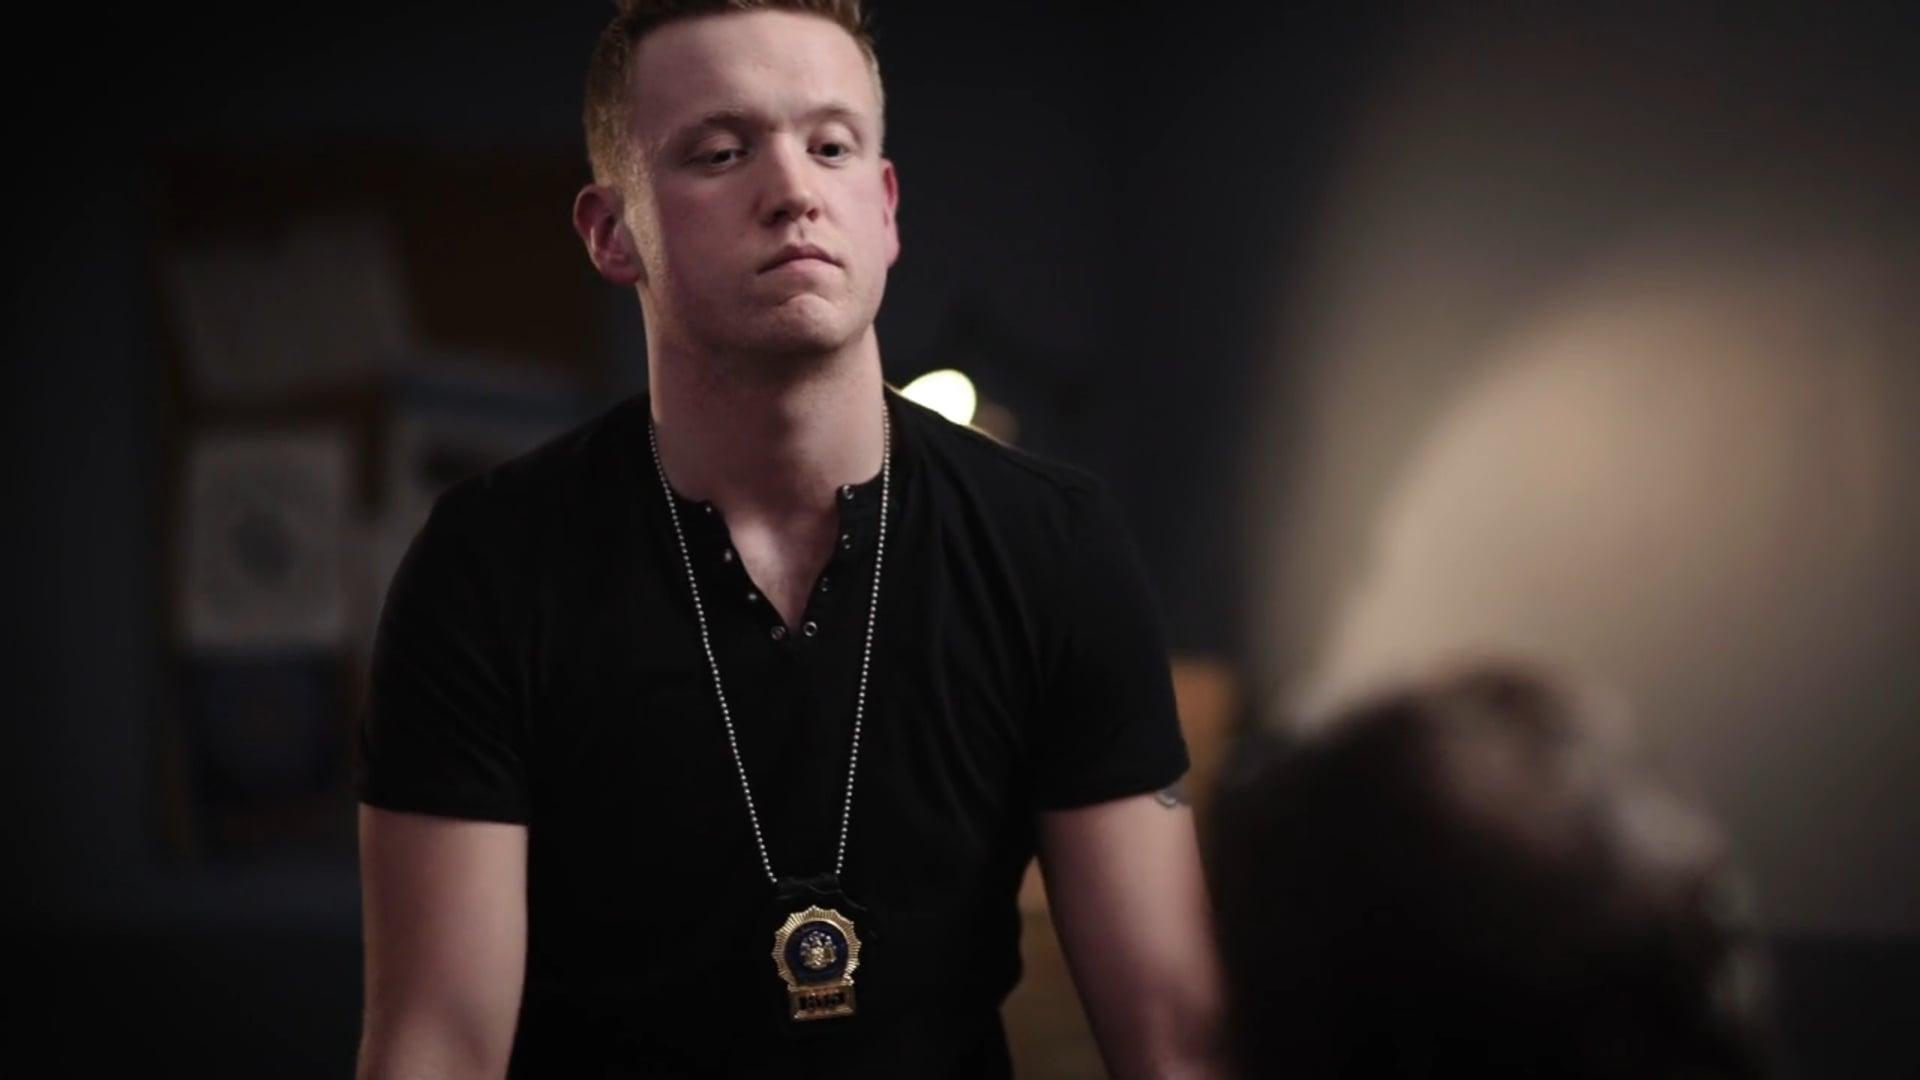 CLIP (DRAMA) - detective/interrogation/procedural [Matt Williams]